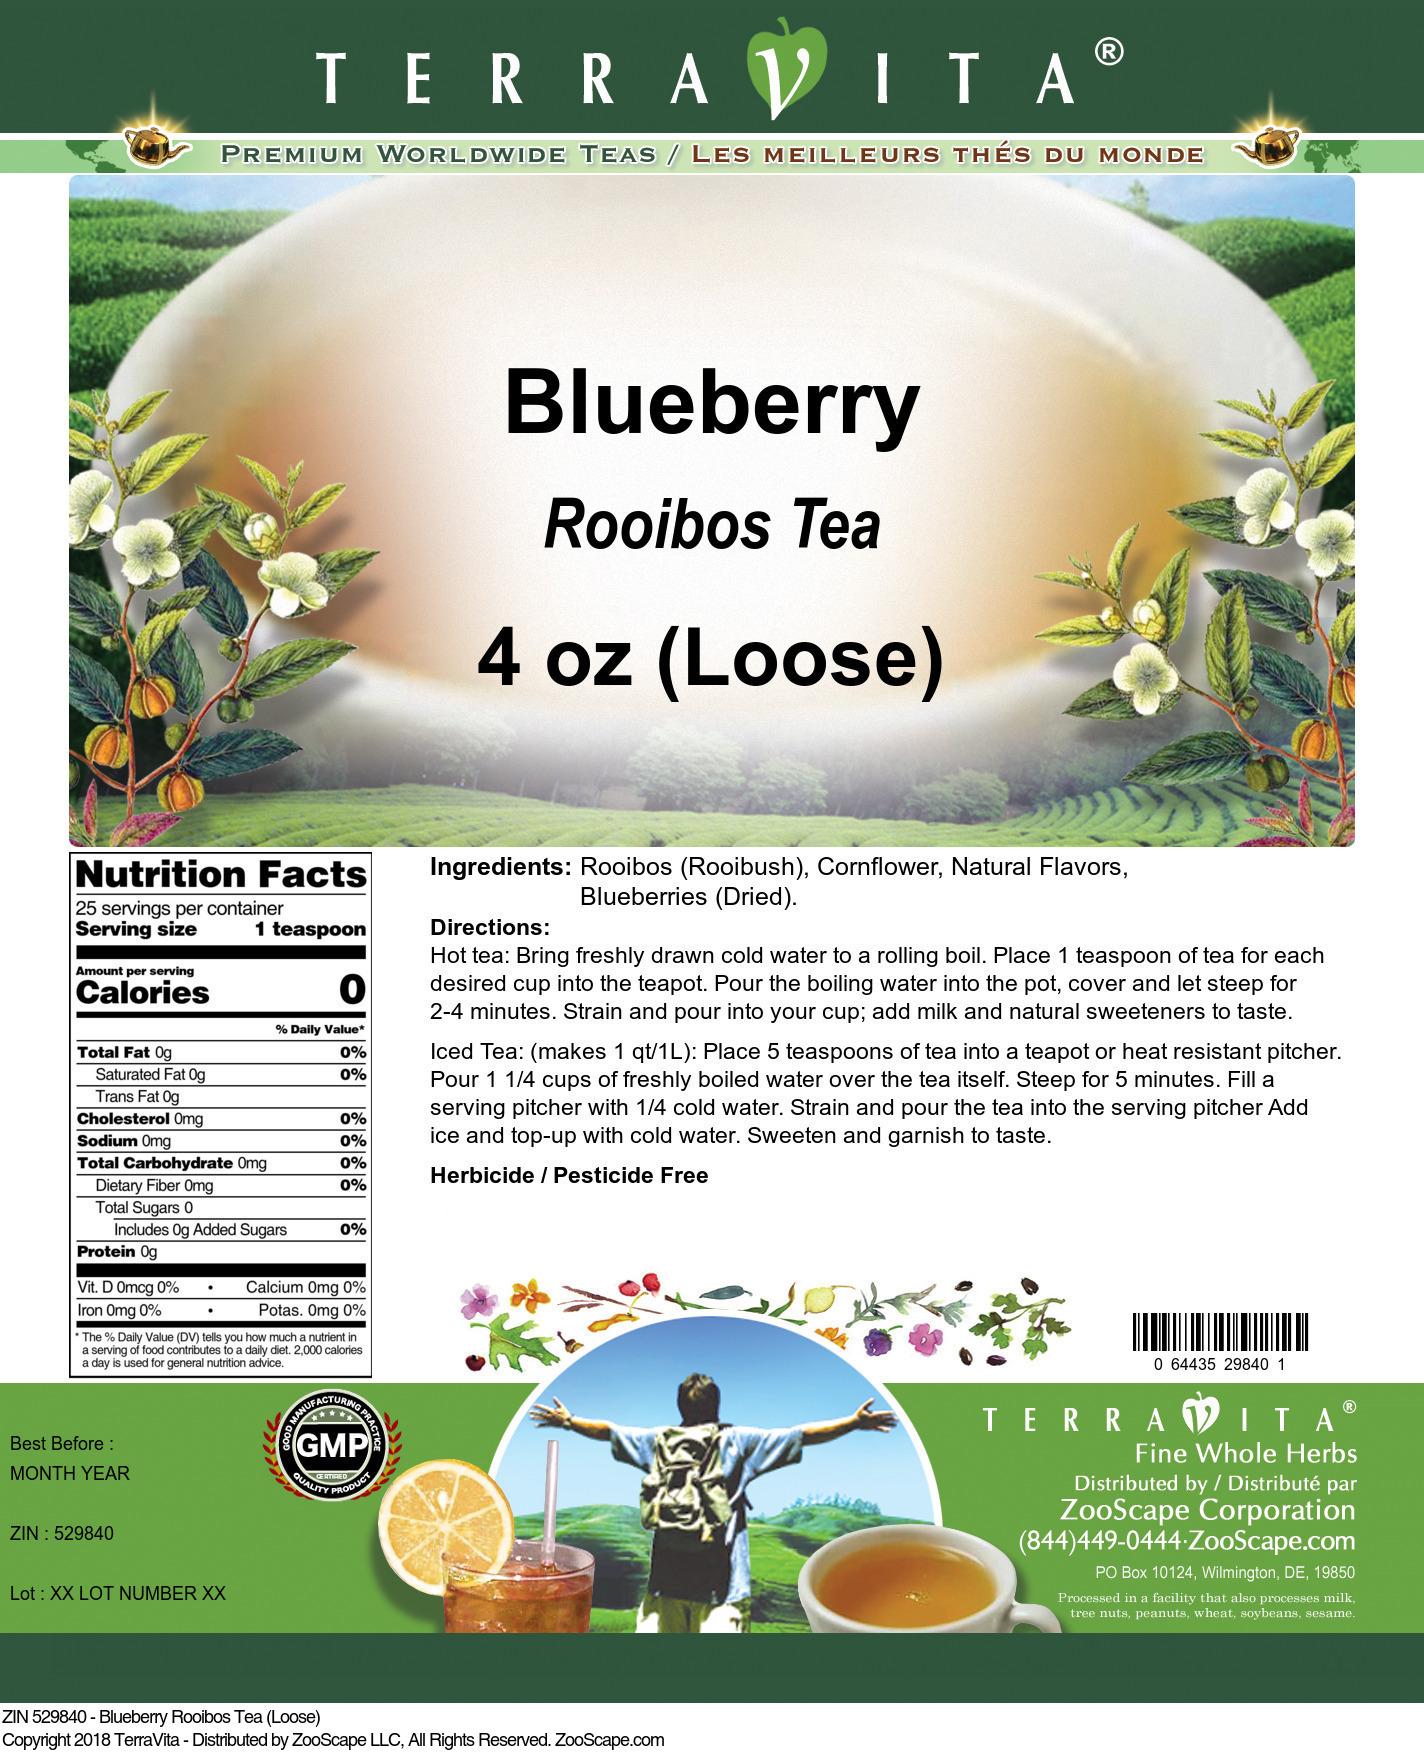 Blueberry Rooibos Tea (Loose)